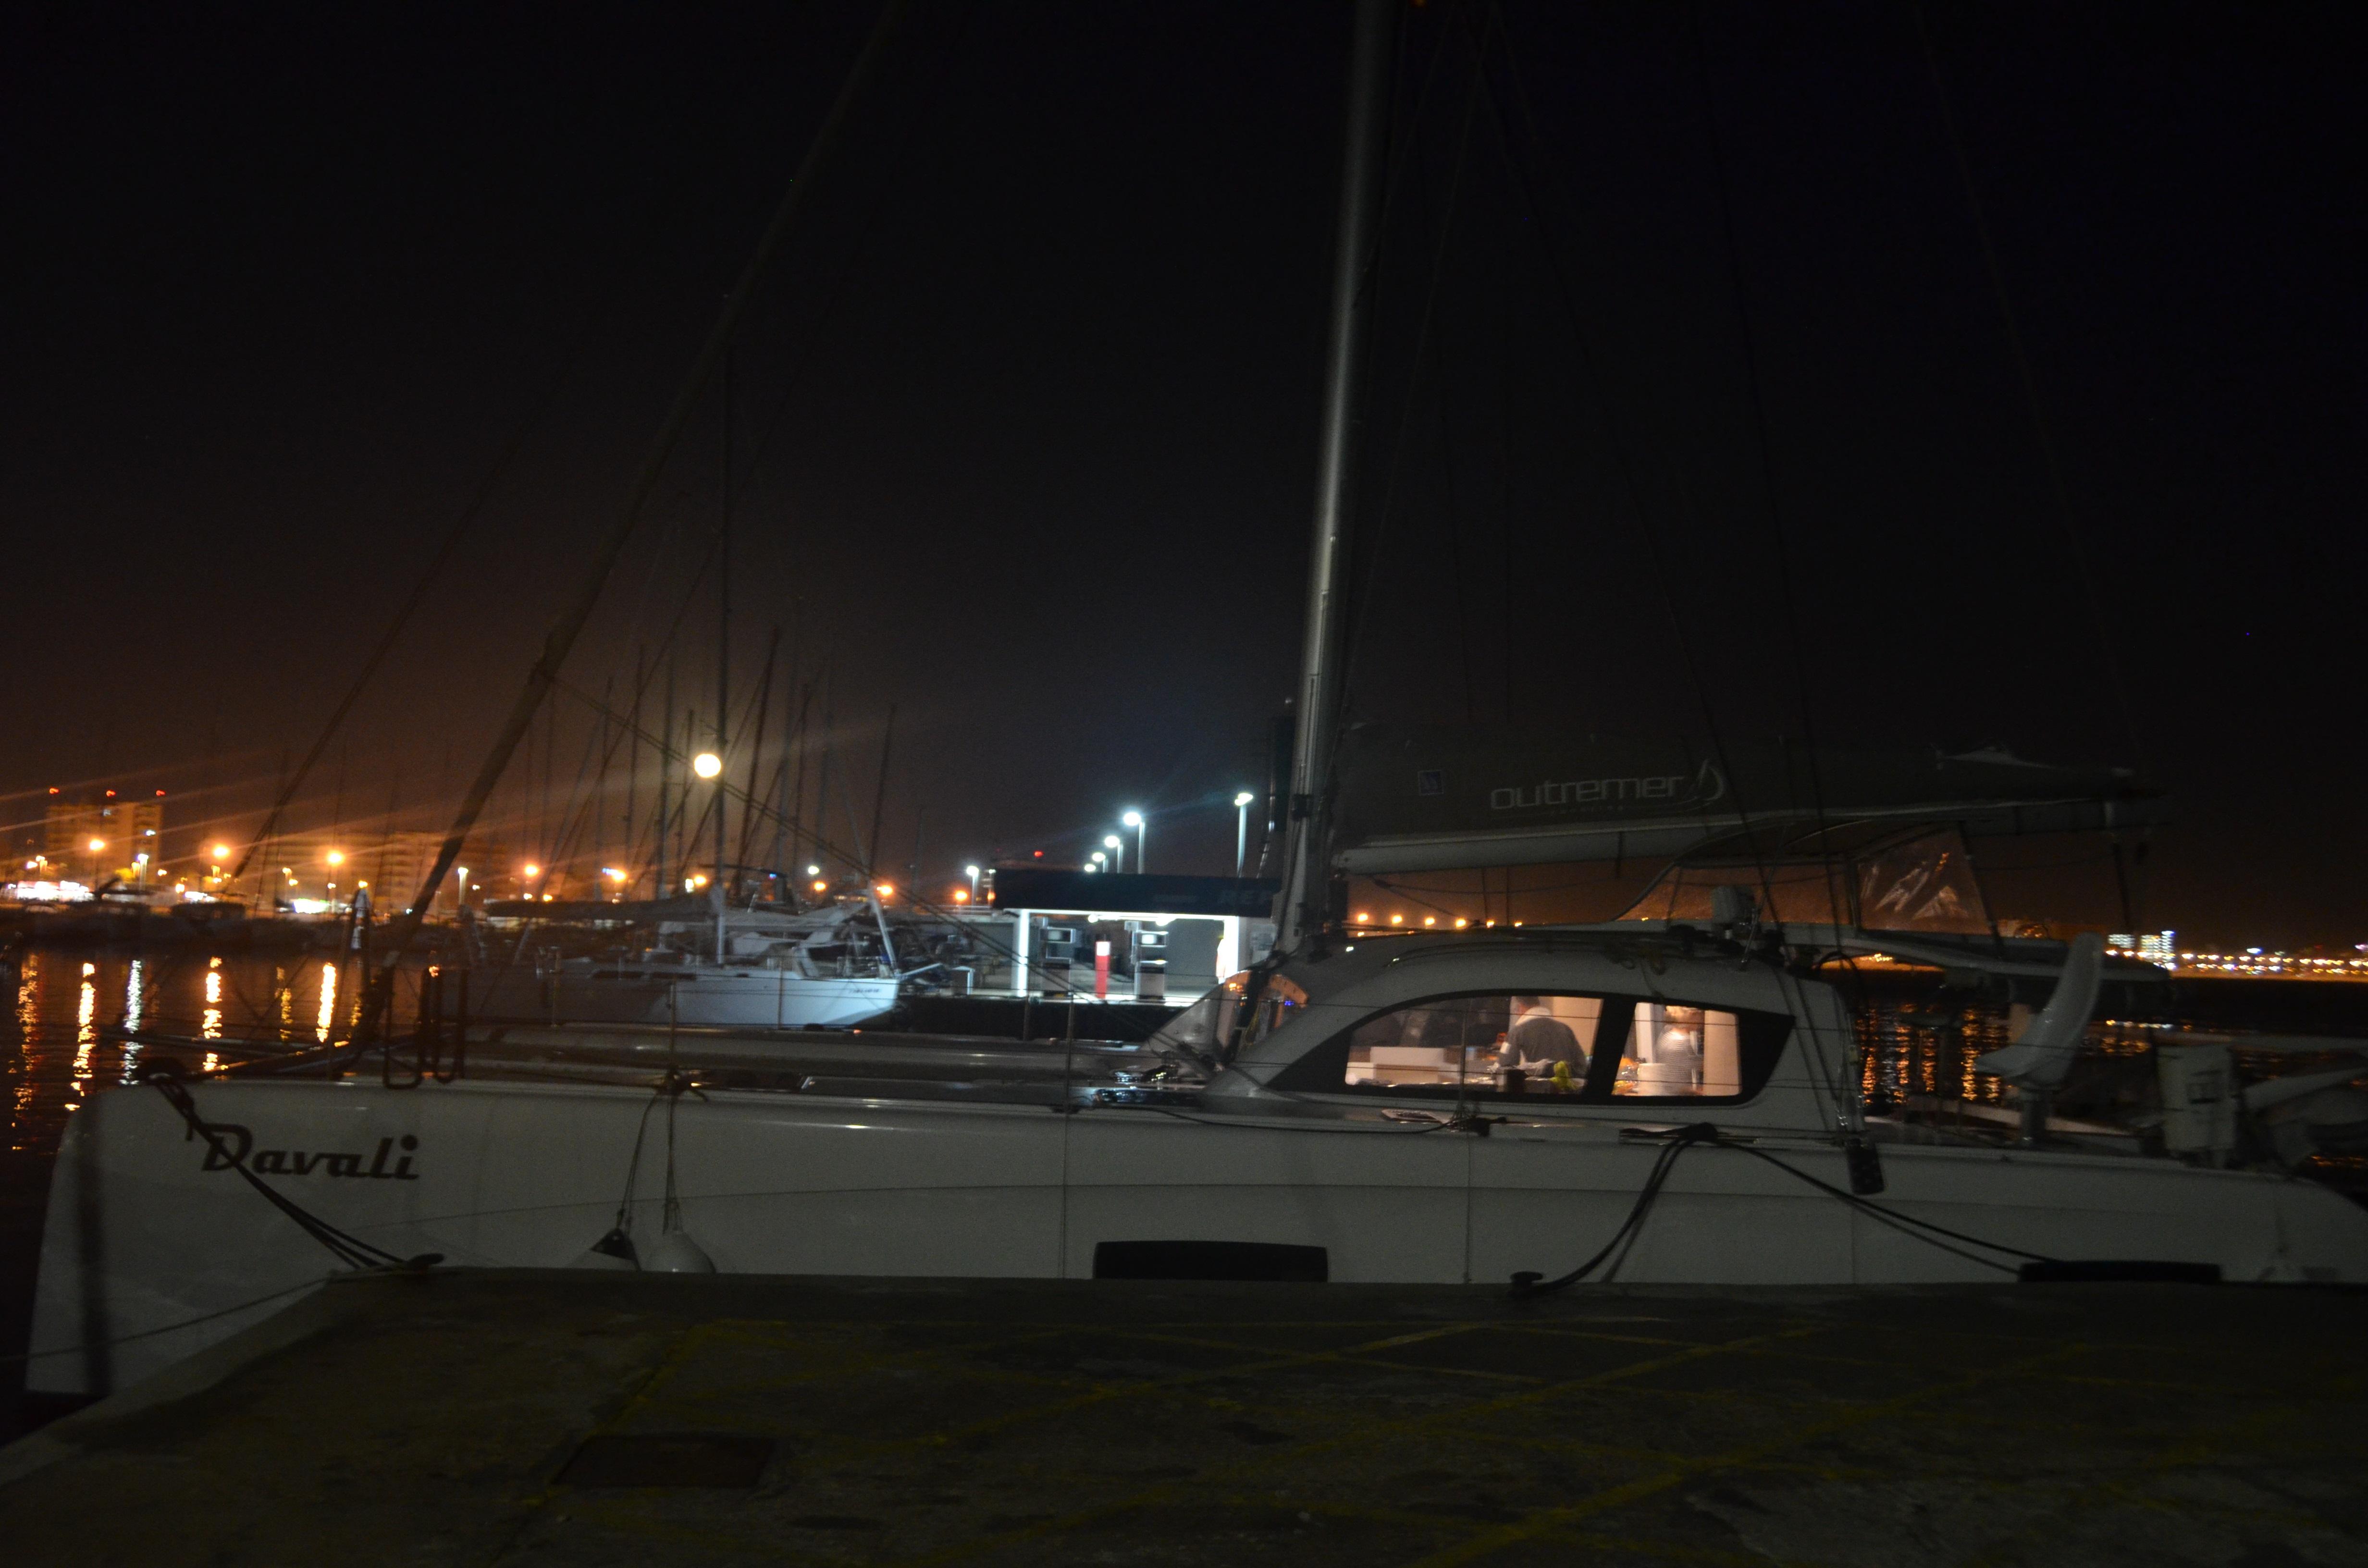 Catamaran/page/3